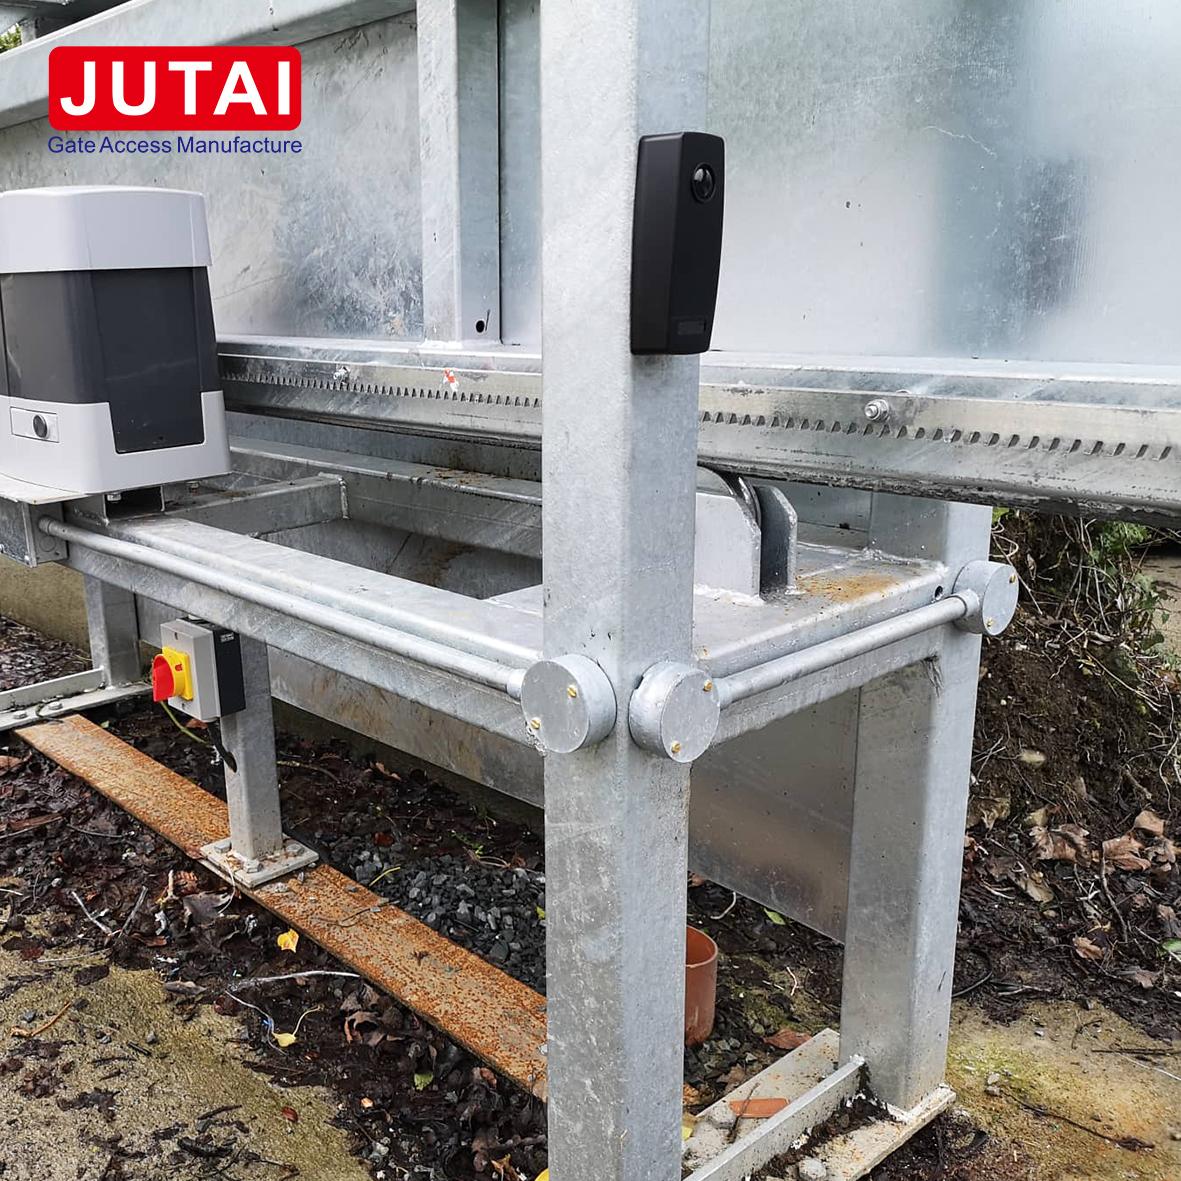 Automatische Gate-Funkbatterie-Infrarotstrahl-Fotozelle